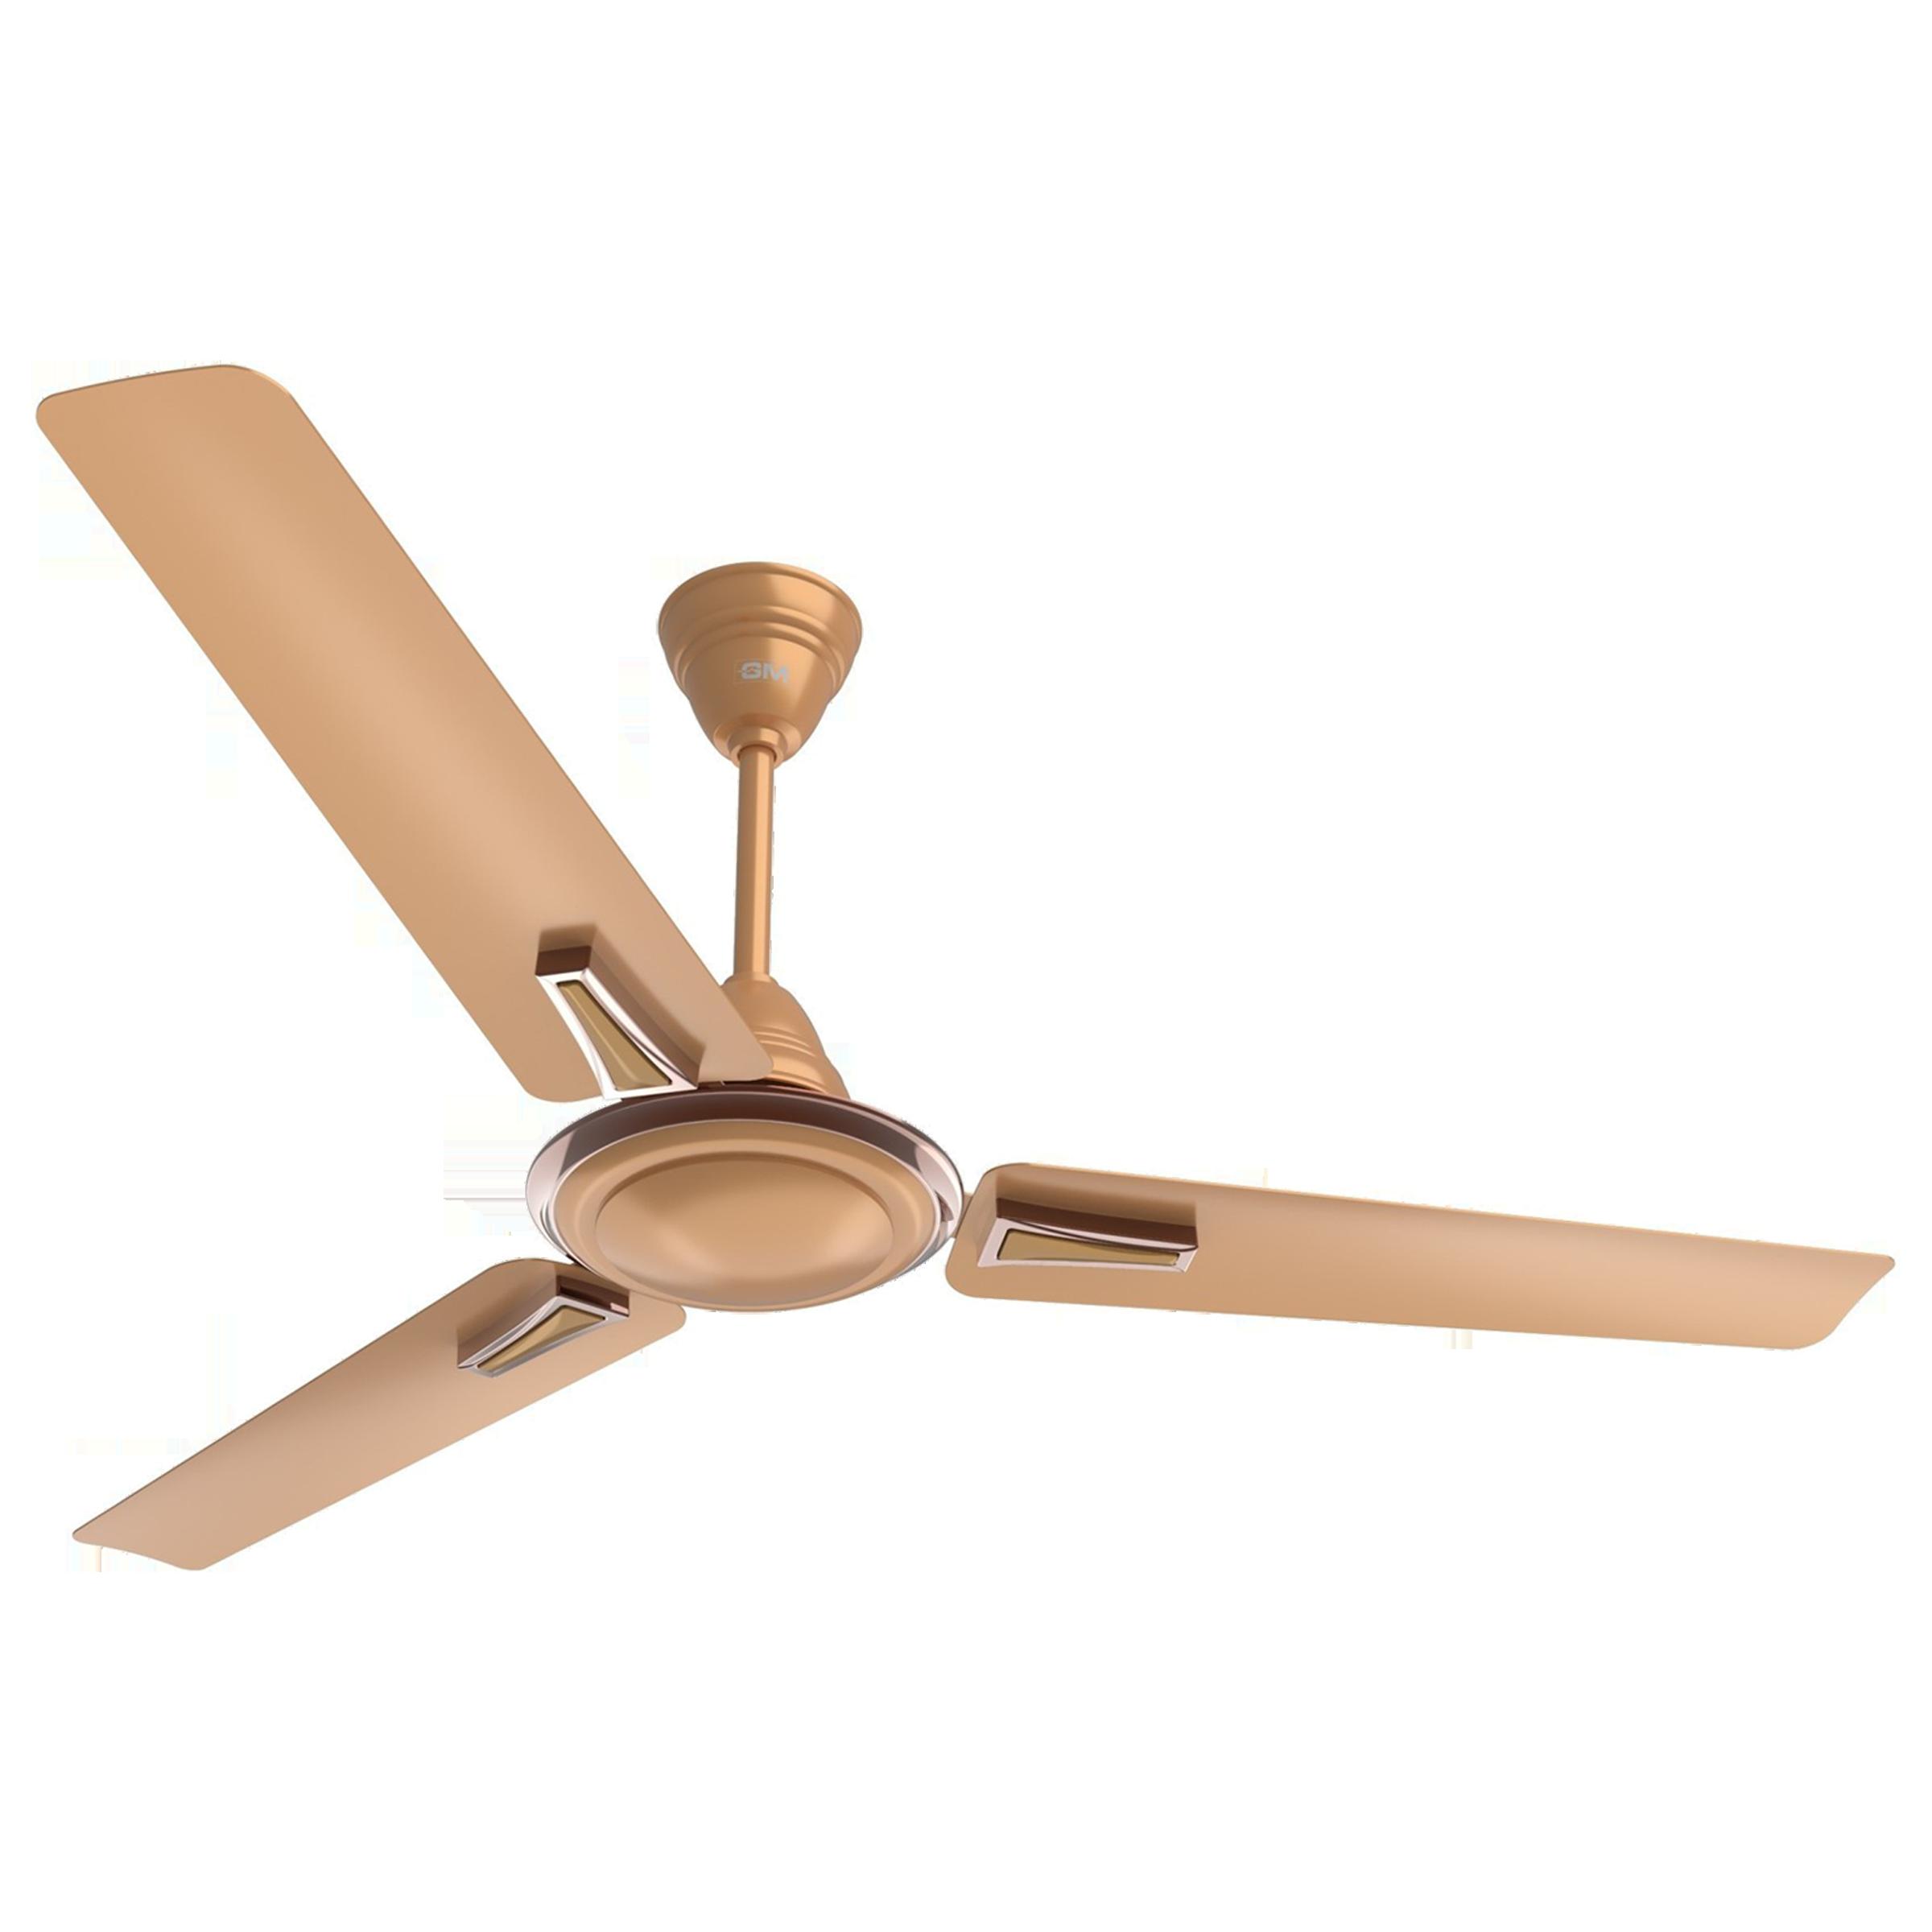 GM Airwave Premium 120 cm Sweep 3 Blade Ceiling Fan (Aerodynamically Designed Blades, CFP480026RGMC, Gold)_1